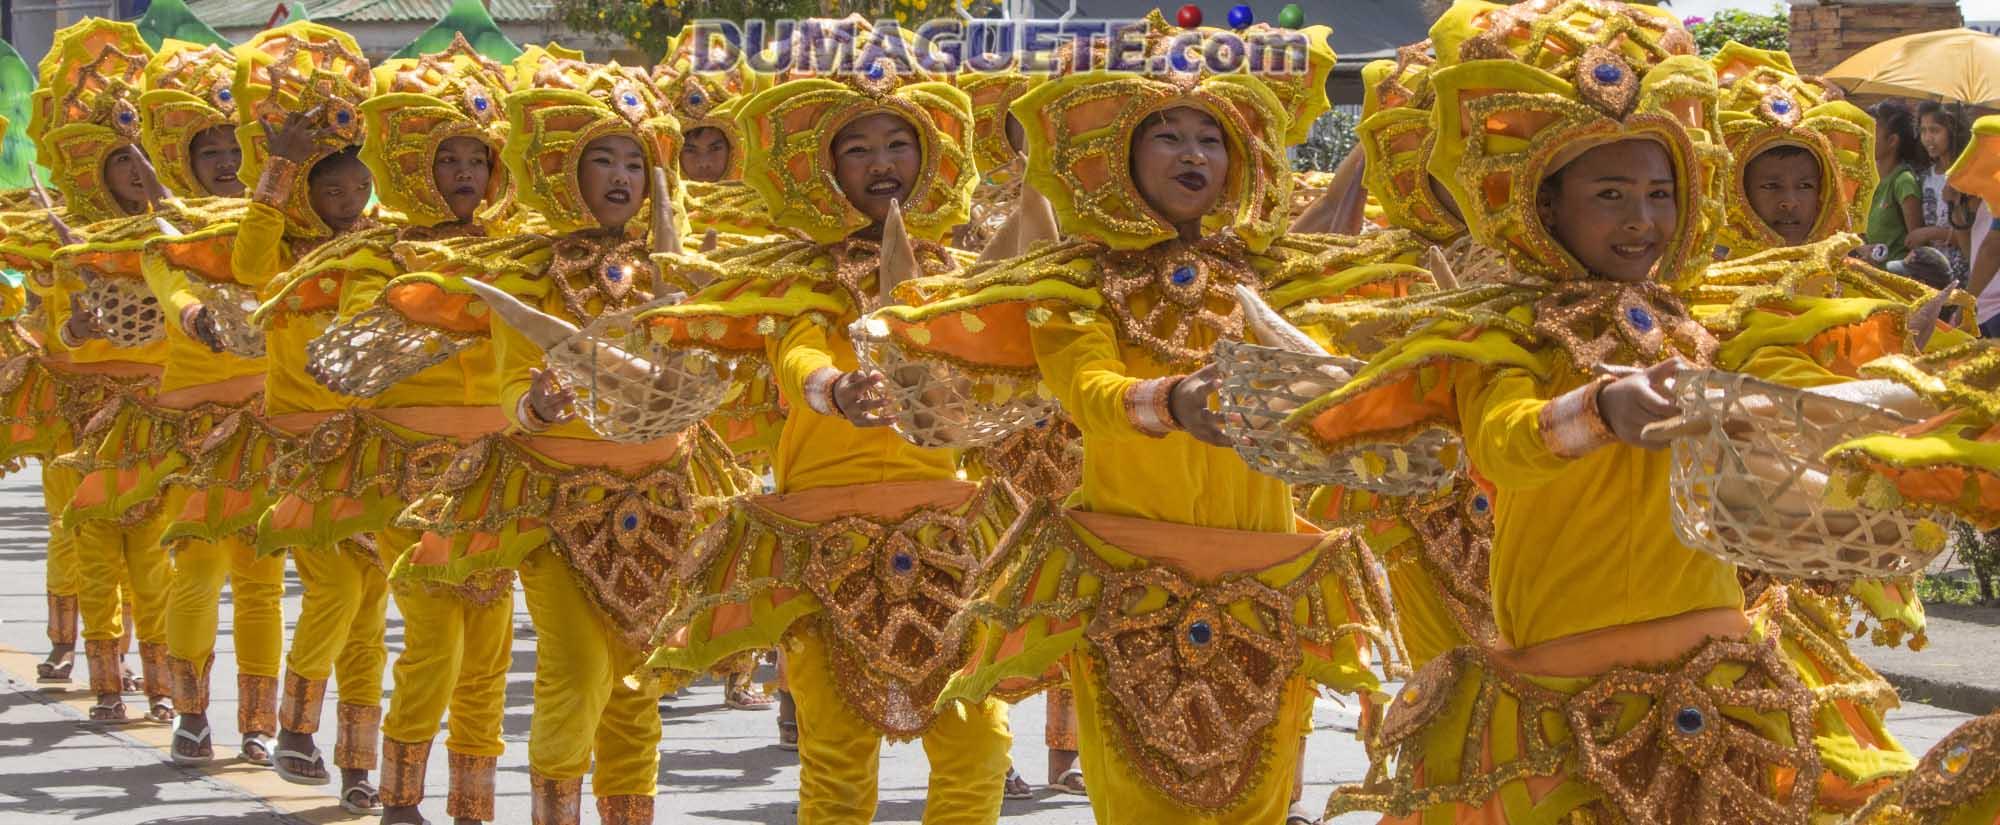 Calle de Bailar 2019 - Tayasan - Street Dancing - Header